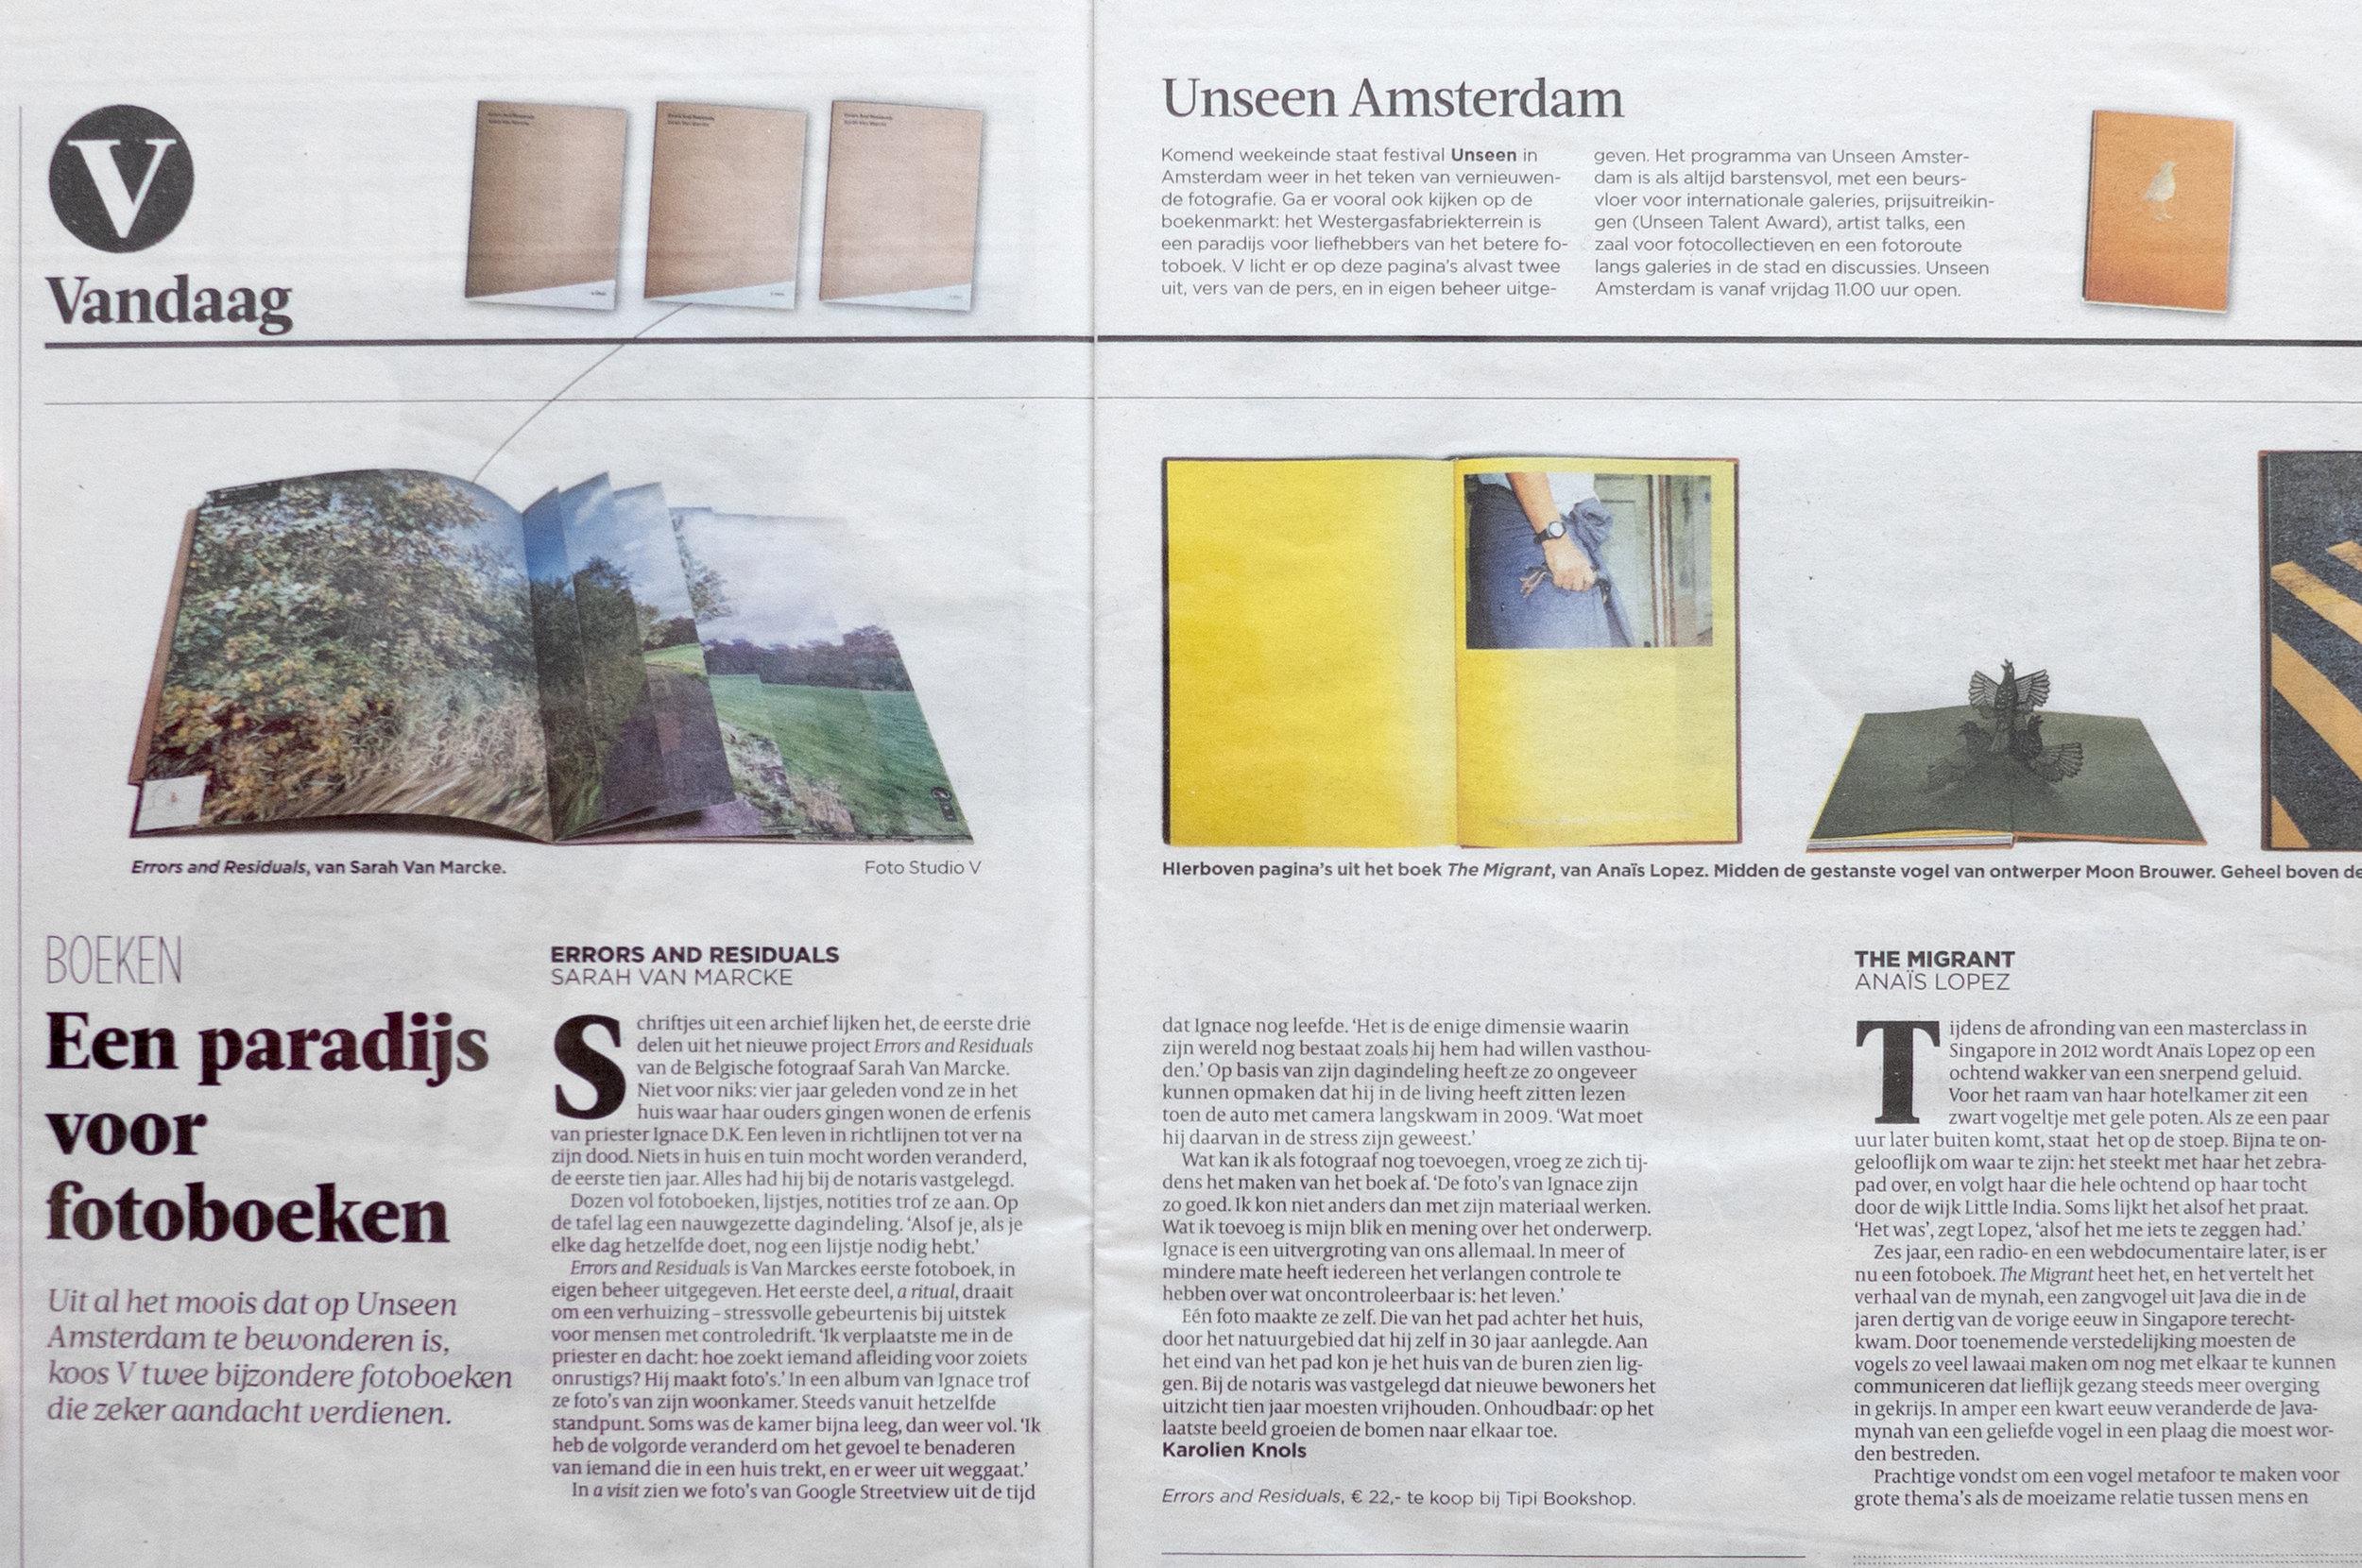 Book review - De Volkskrant - 21 september 2018